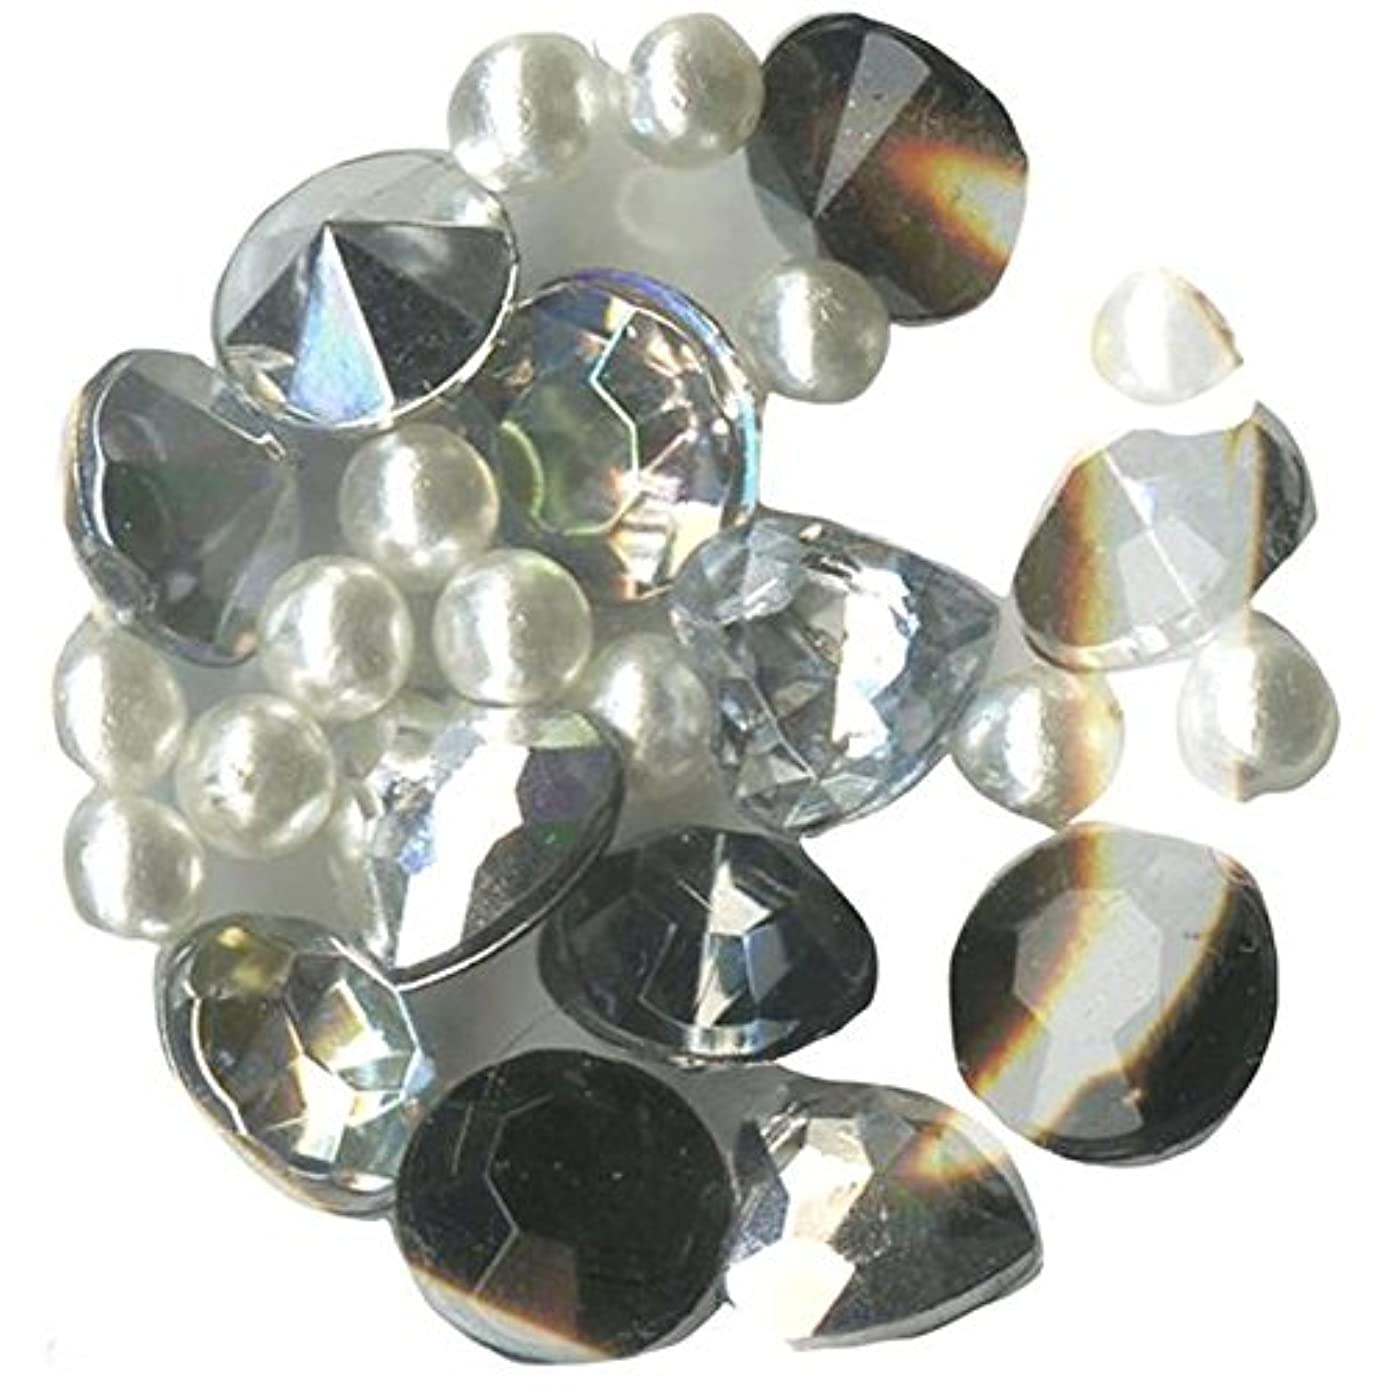 Blue Moon Beads Story Lockets Acrylic Charm, Diamonds, Assortment